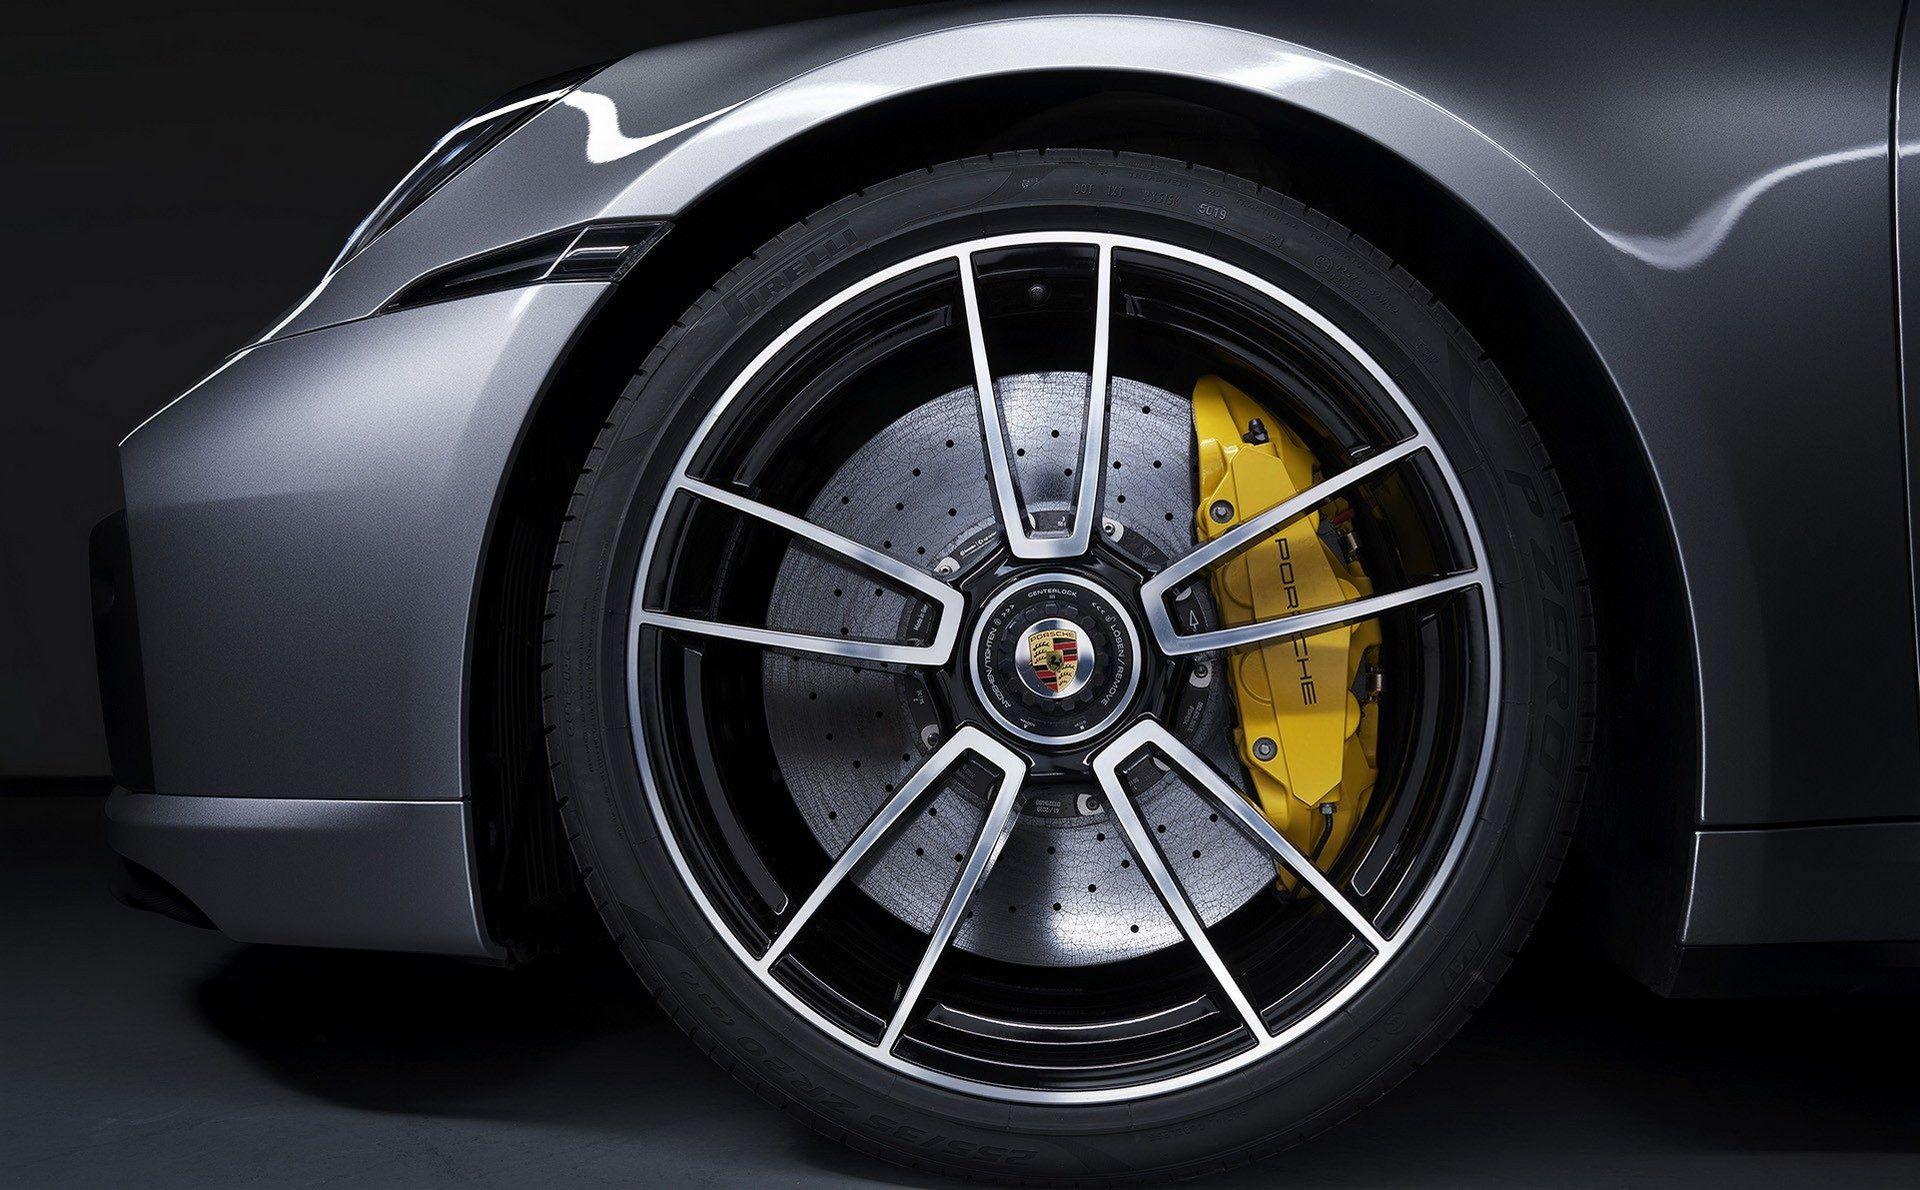 Porsche-911-Turbo-S-2020-37